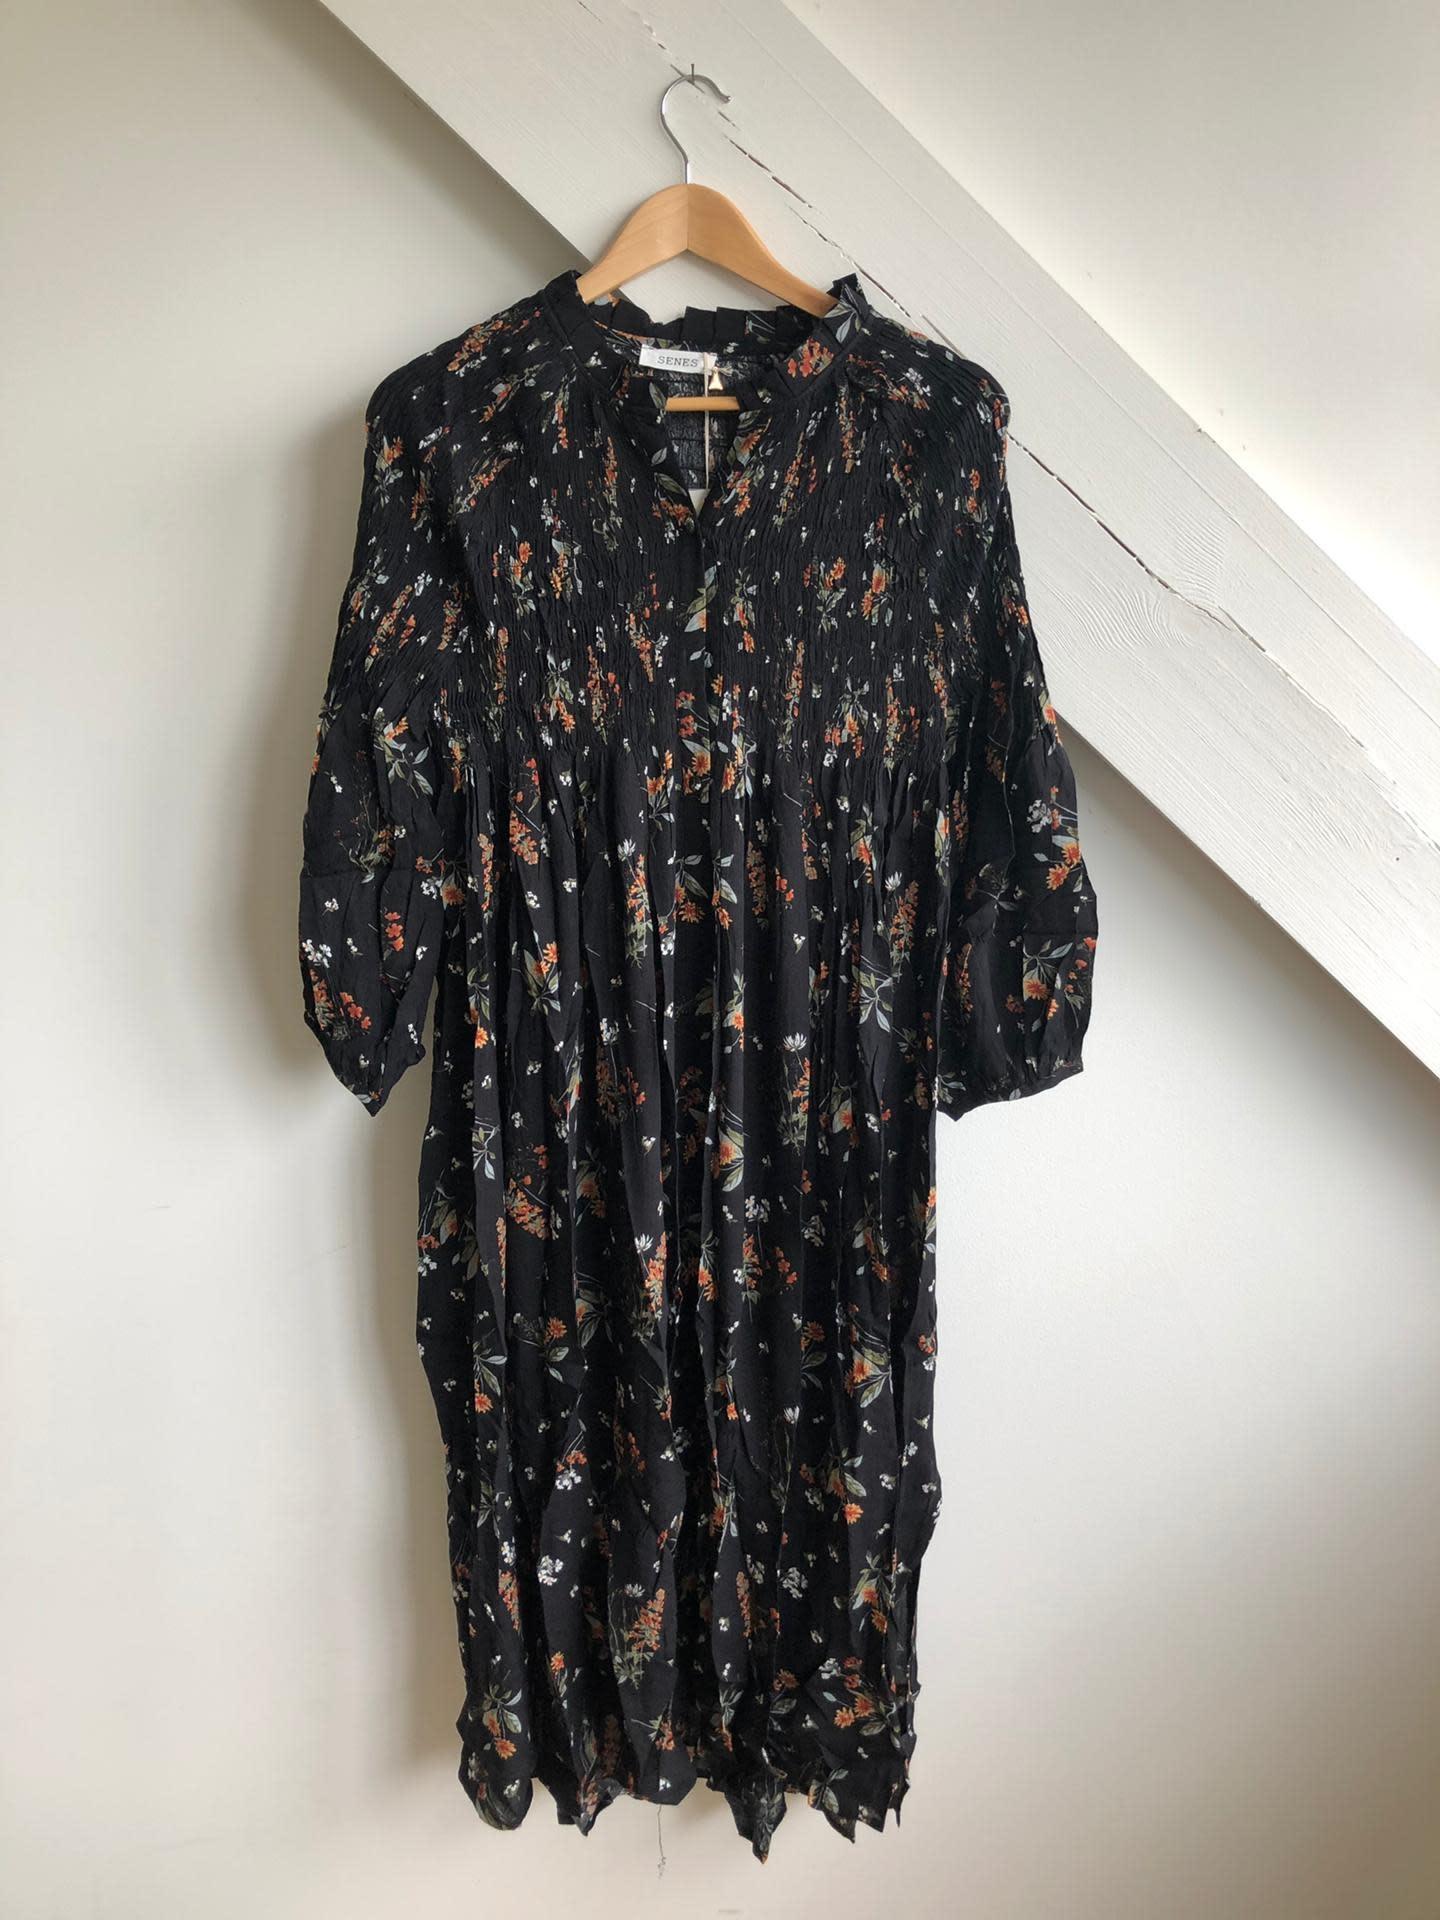 Dress Flowers Black/Multi Flowers